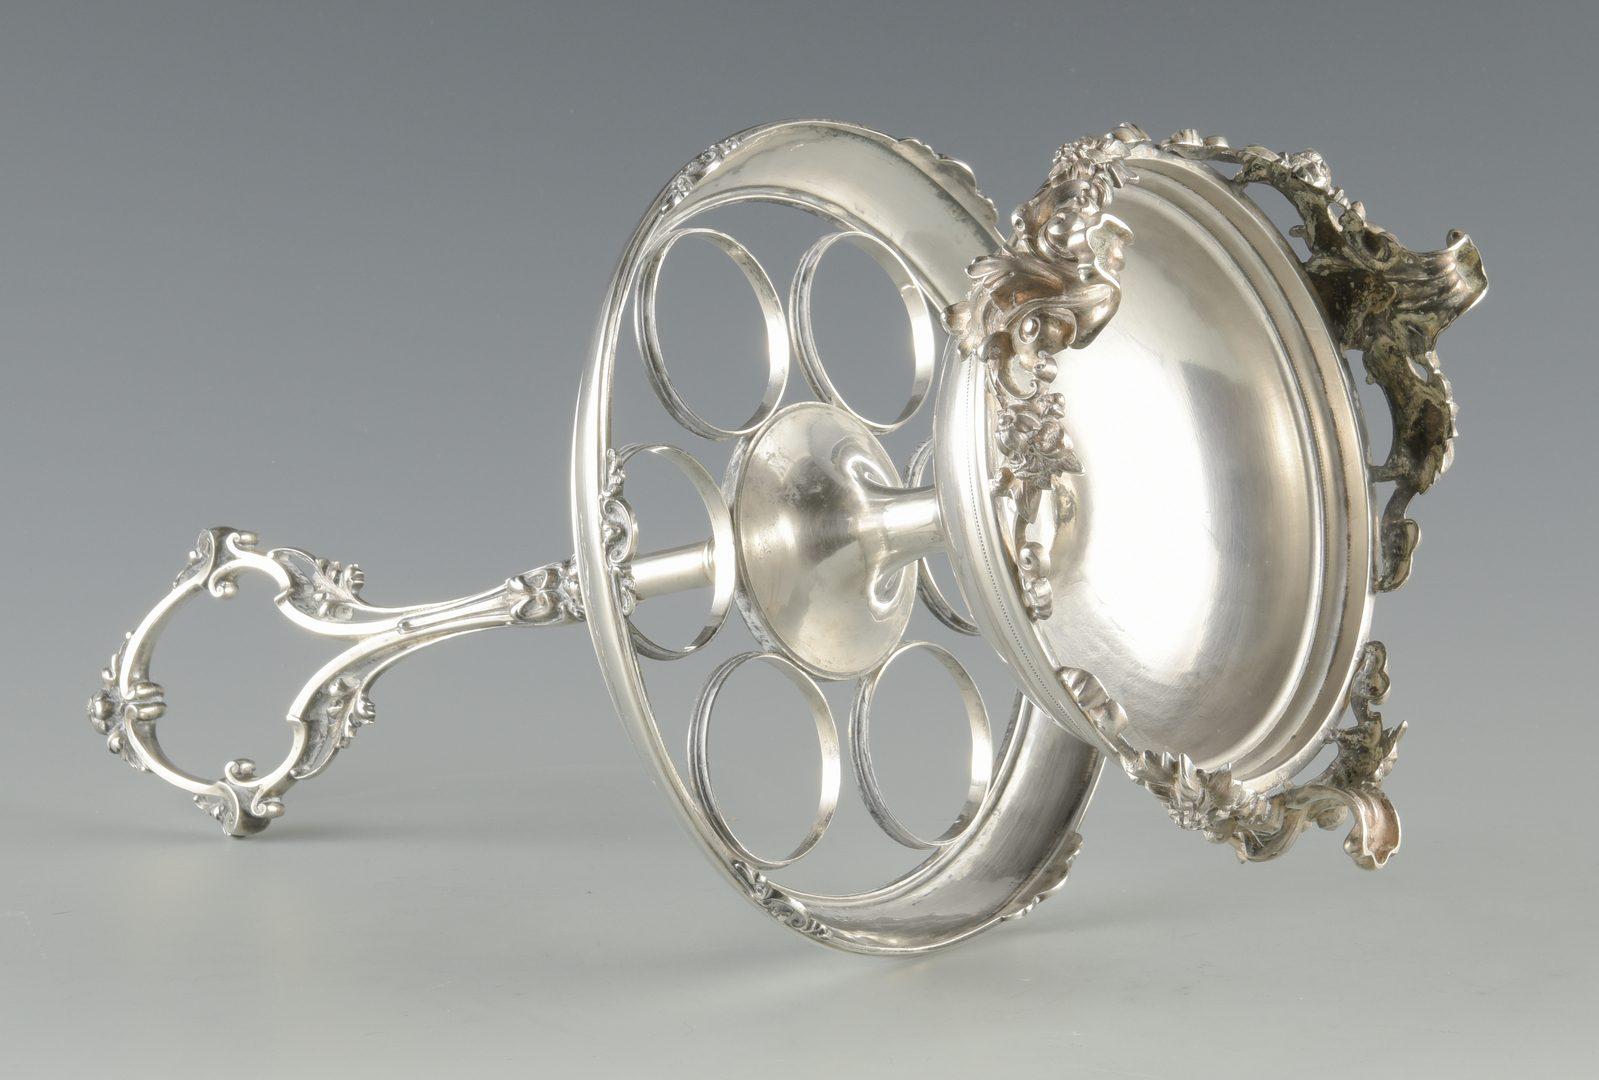 Lot 132: Gorham Coin Silver Cruet